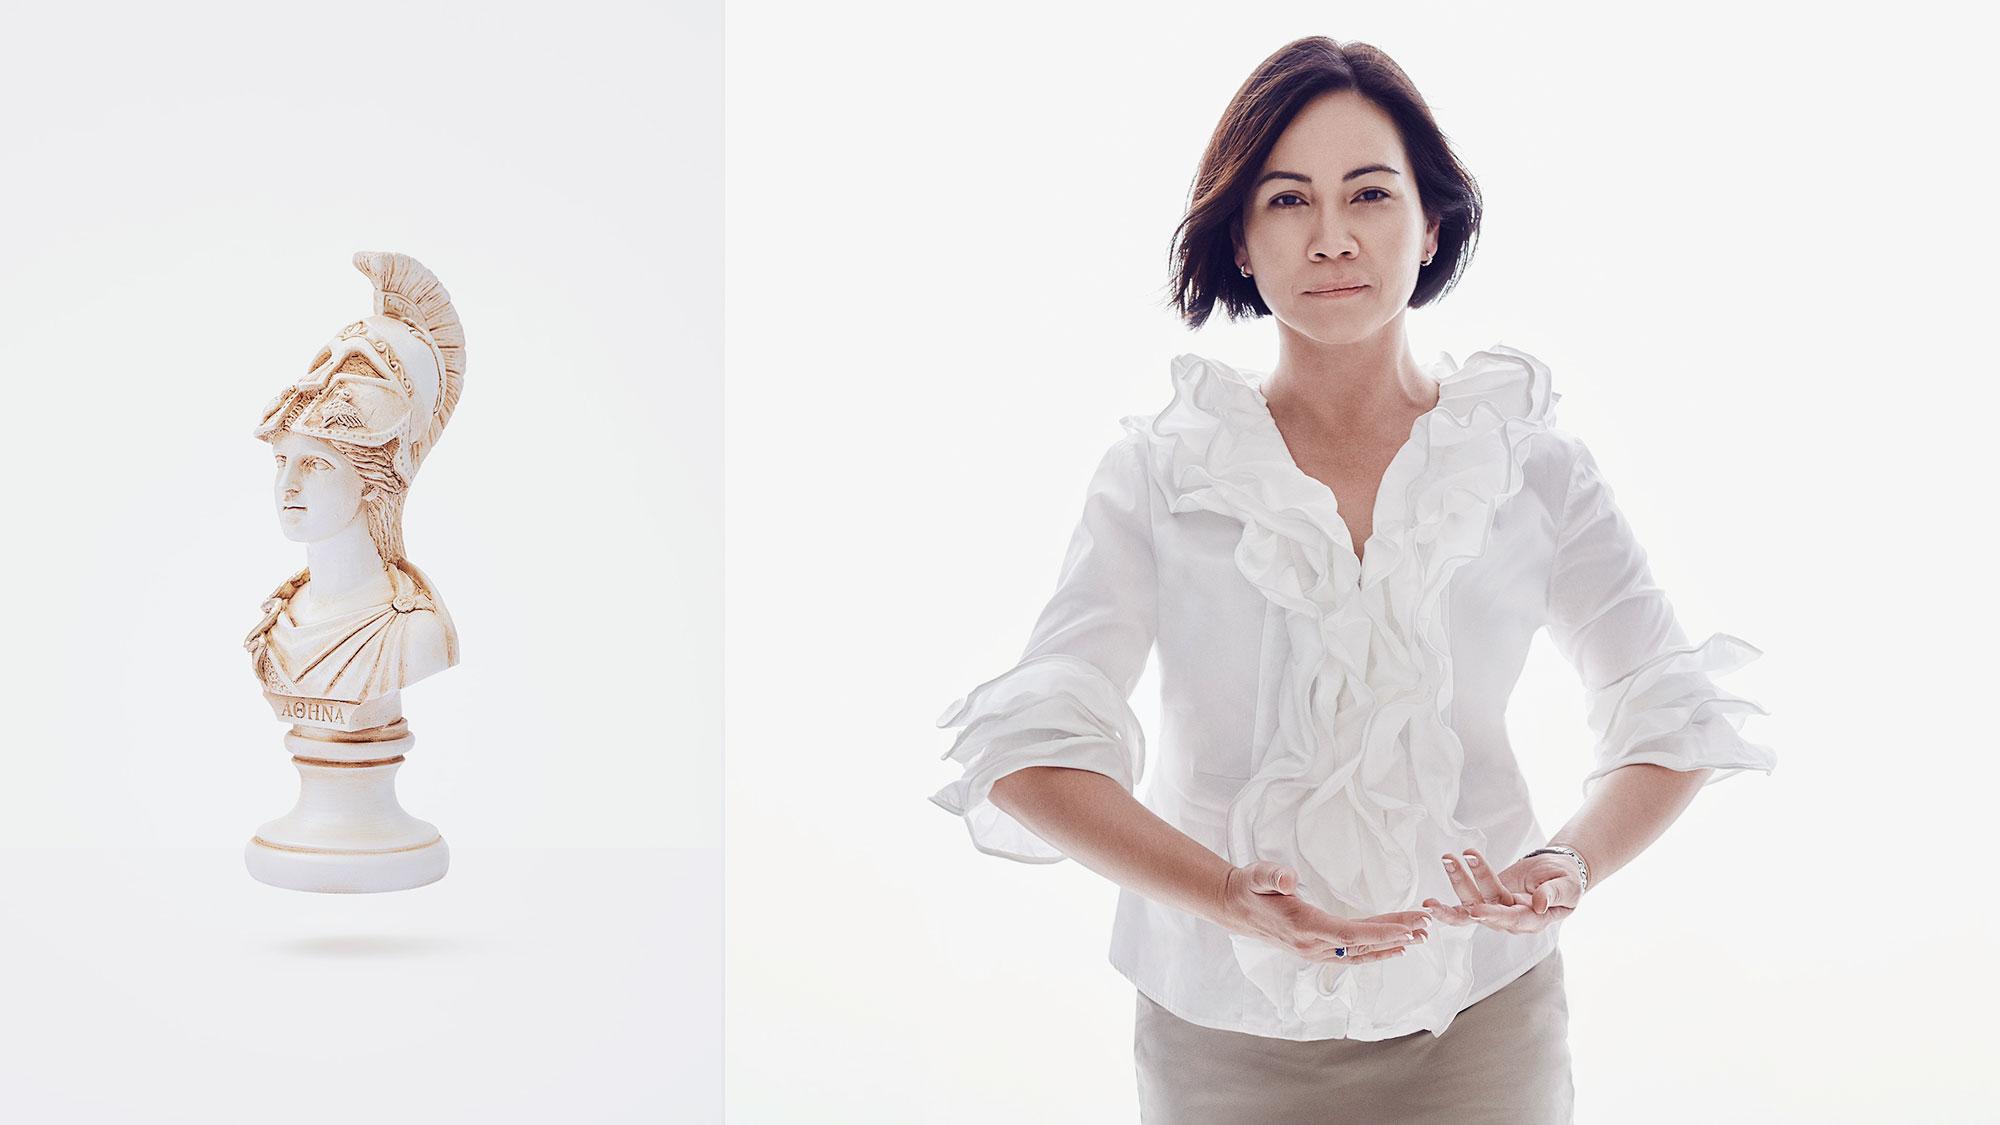 Lara-Izlan-women-in-data-sane-seven-creative-portrait-2000-px-wide